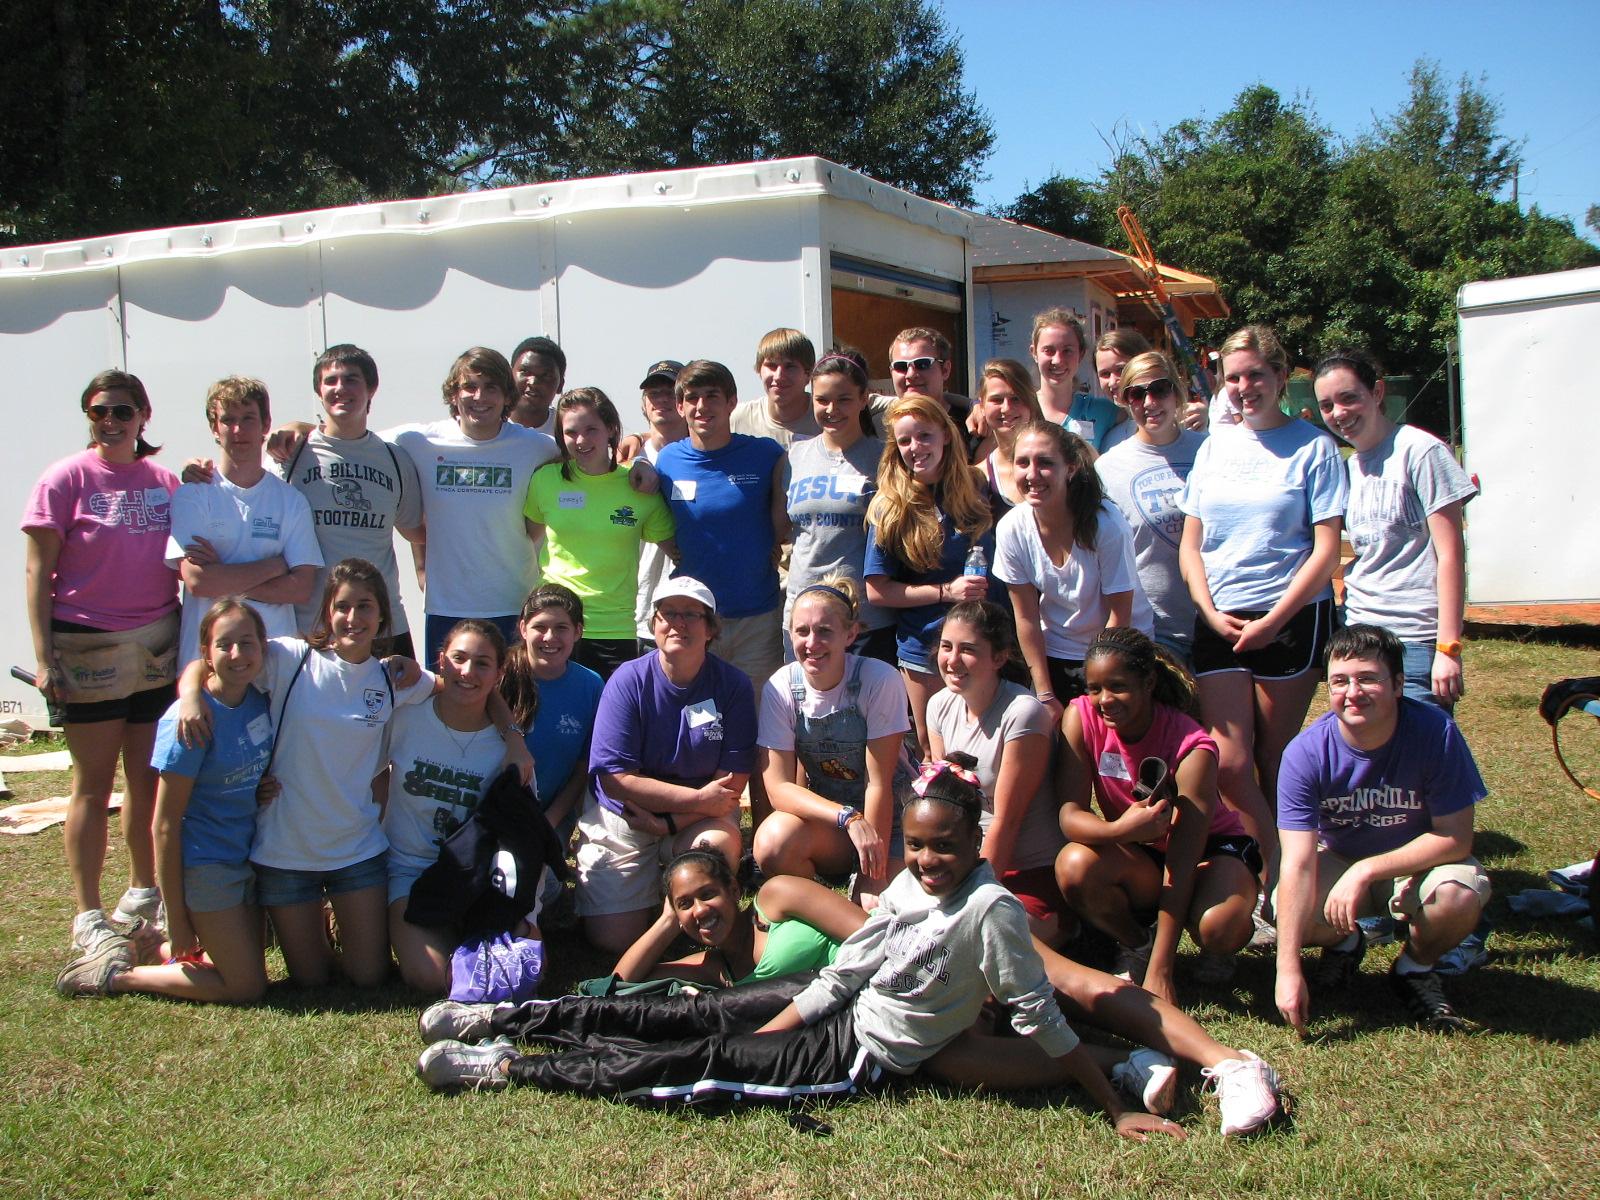 Spring Hill College volunteers